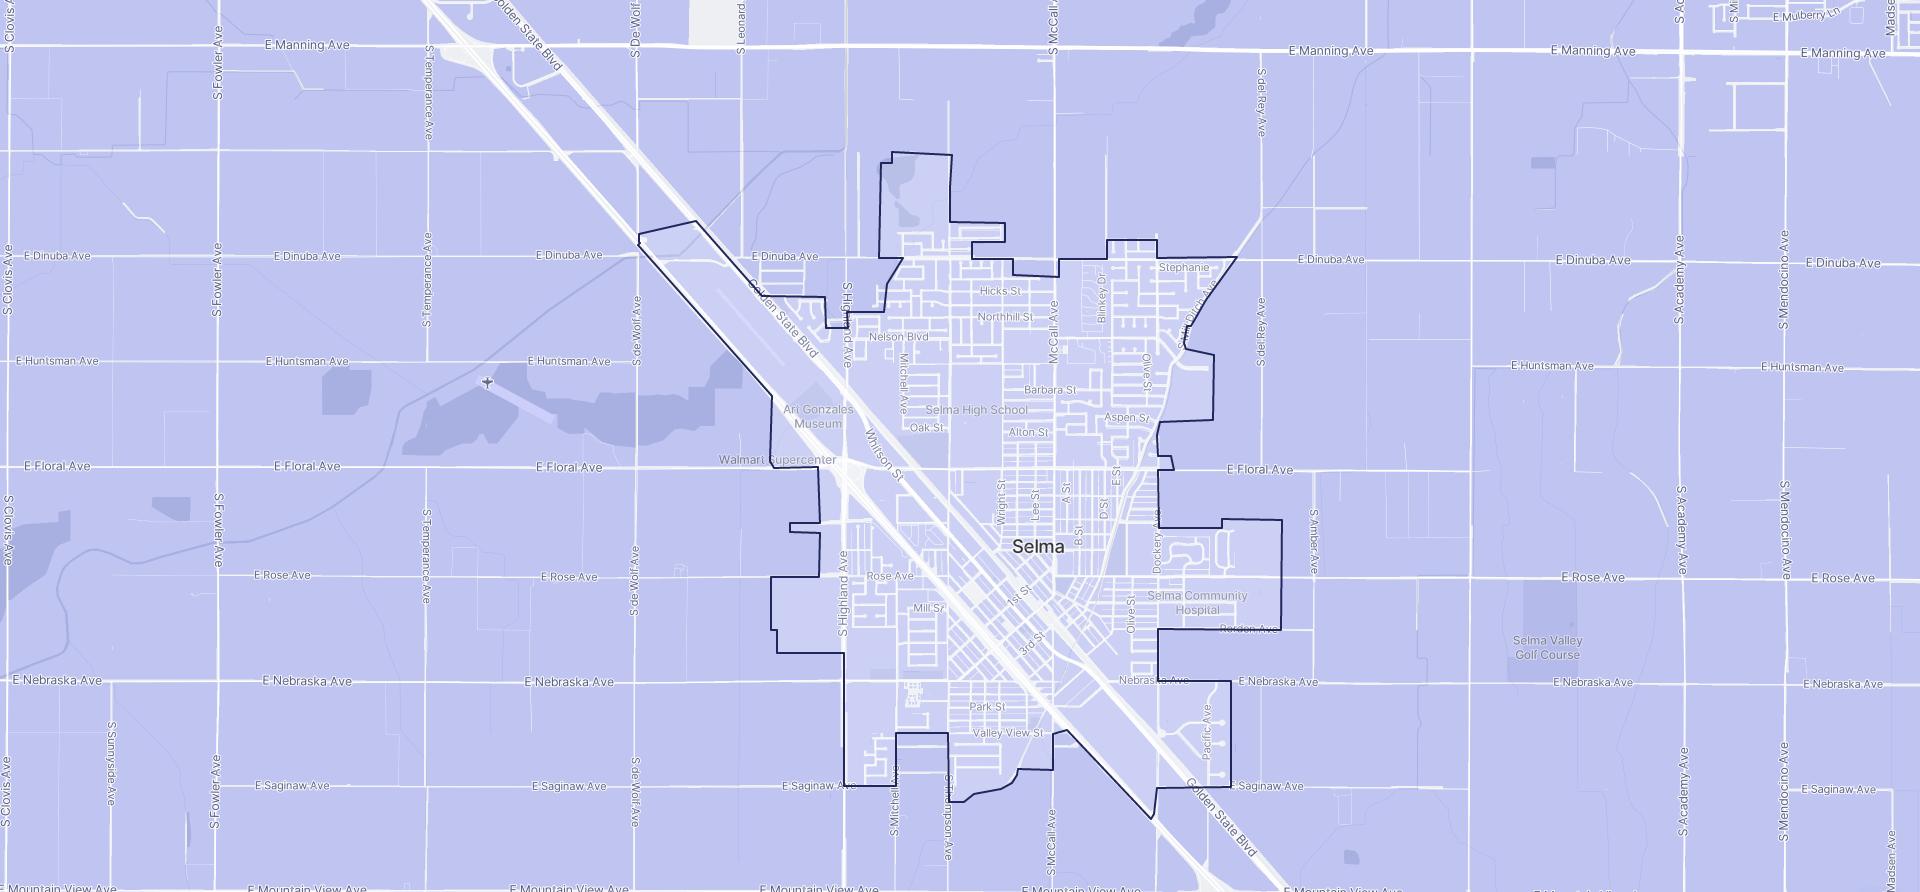 Image of Selma boundaries on a map.